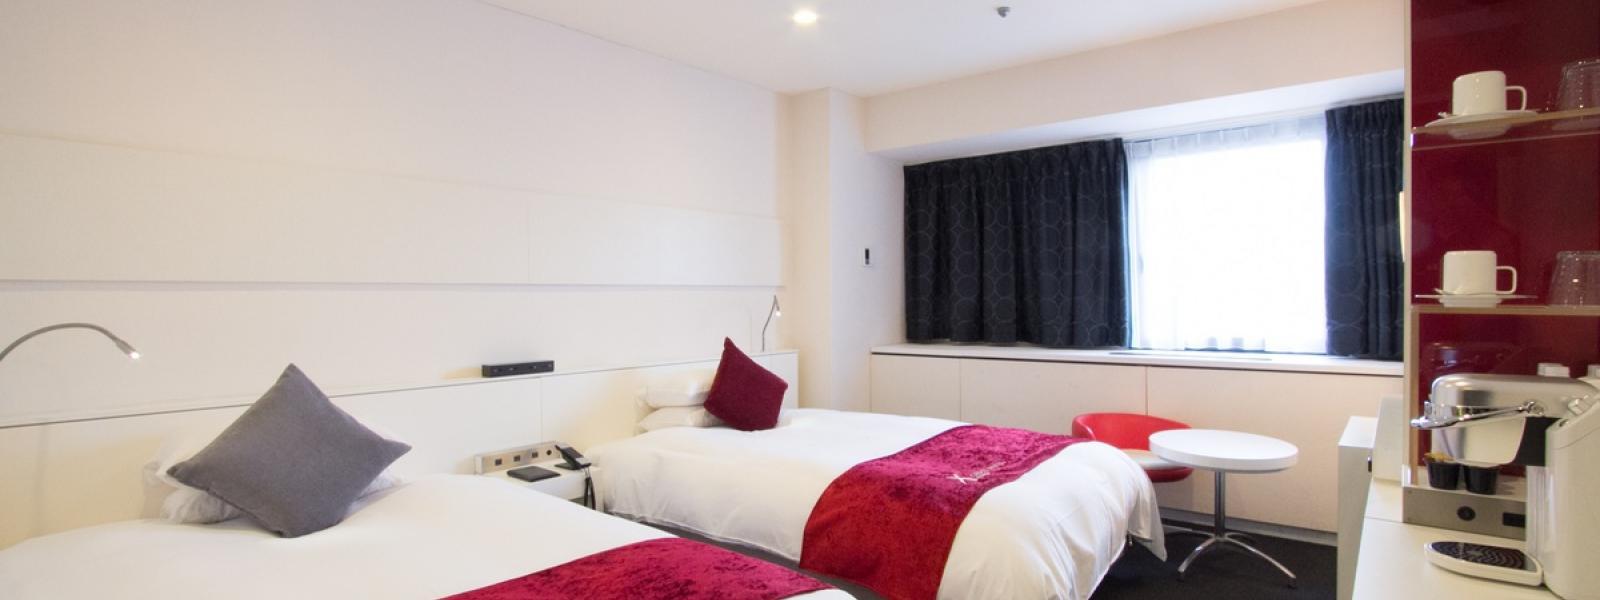 Hotel Room in Osaka